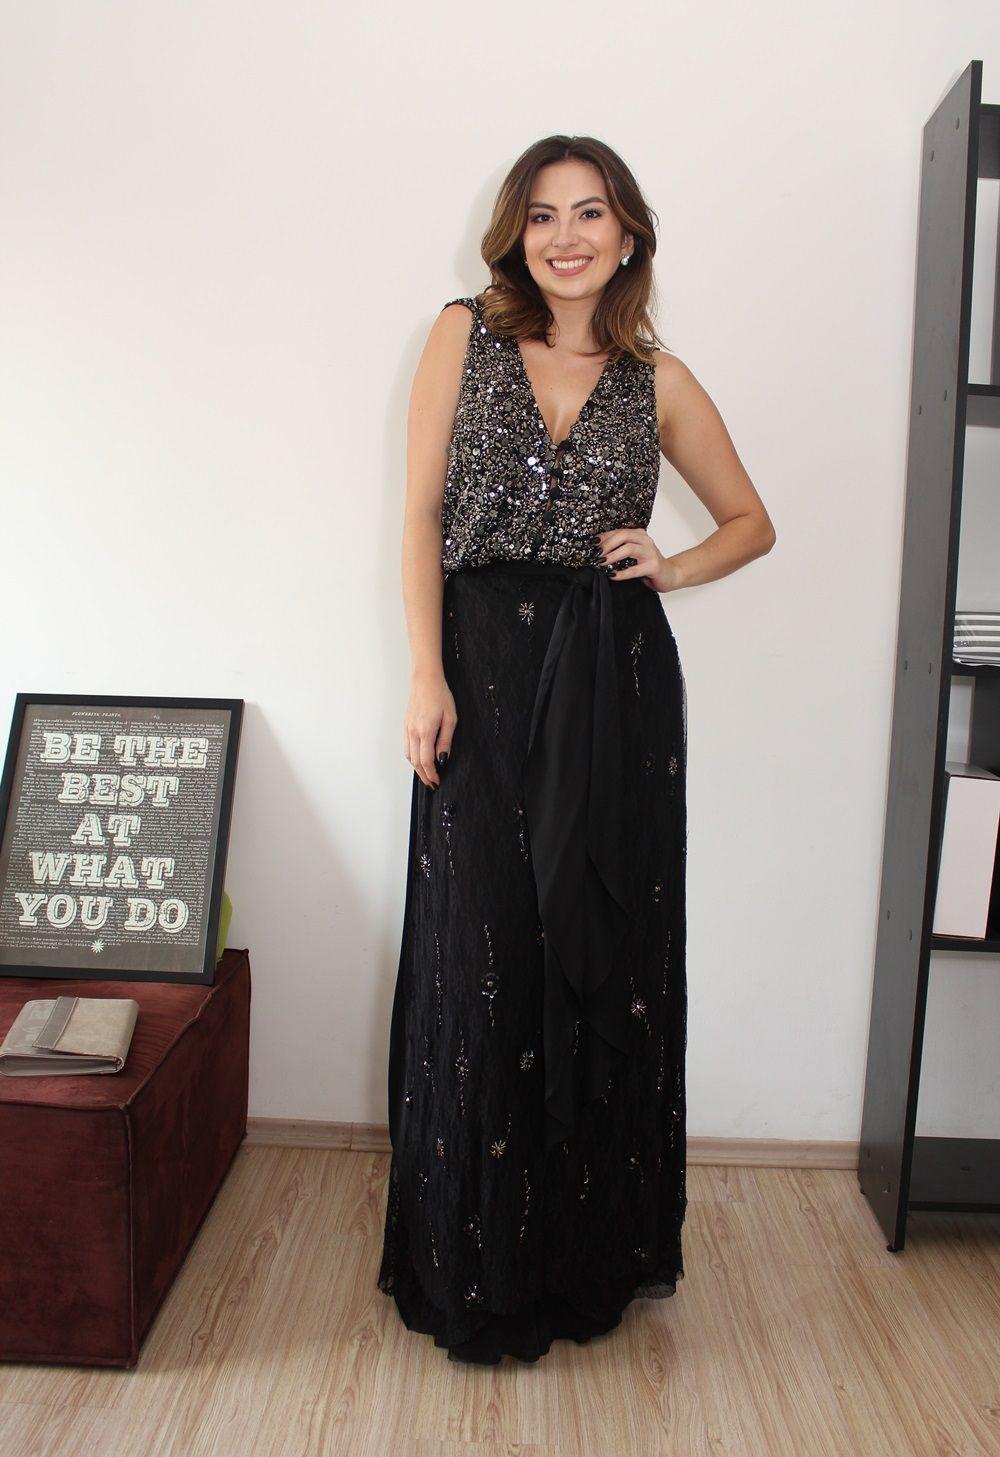 3595a3420 Seu vestido de festa lindo, estiloso e super barato – Veja como! Vestido de